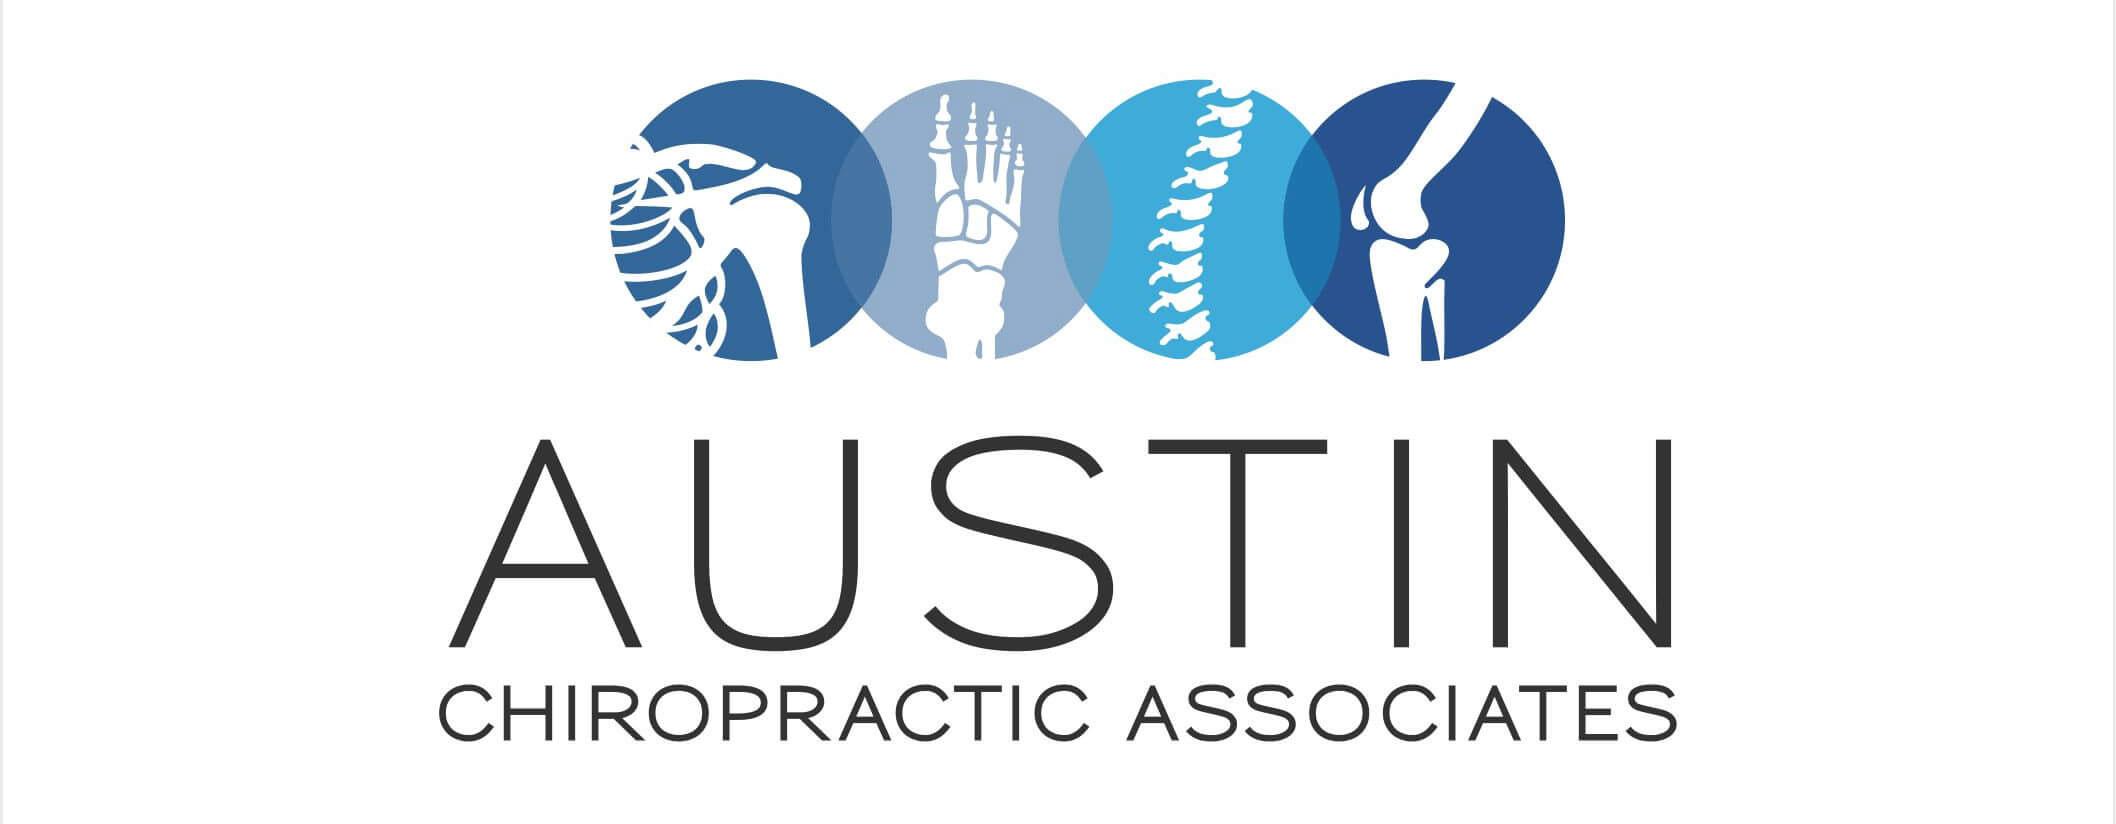 Austin Chiropractic Associates